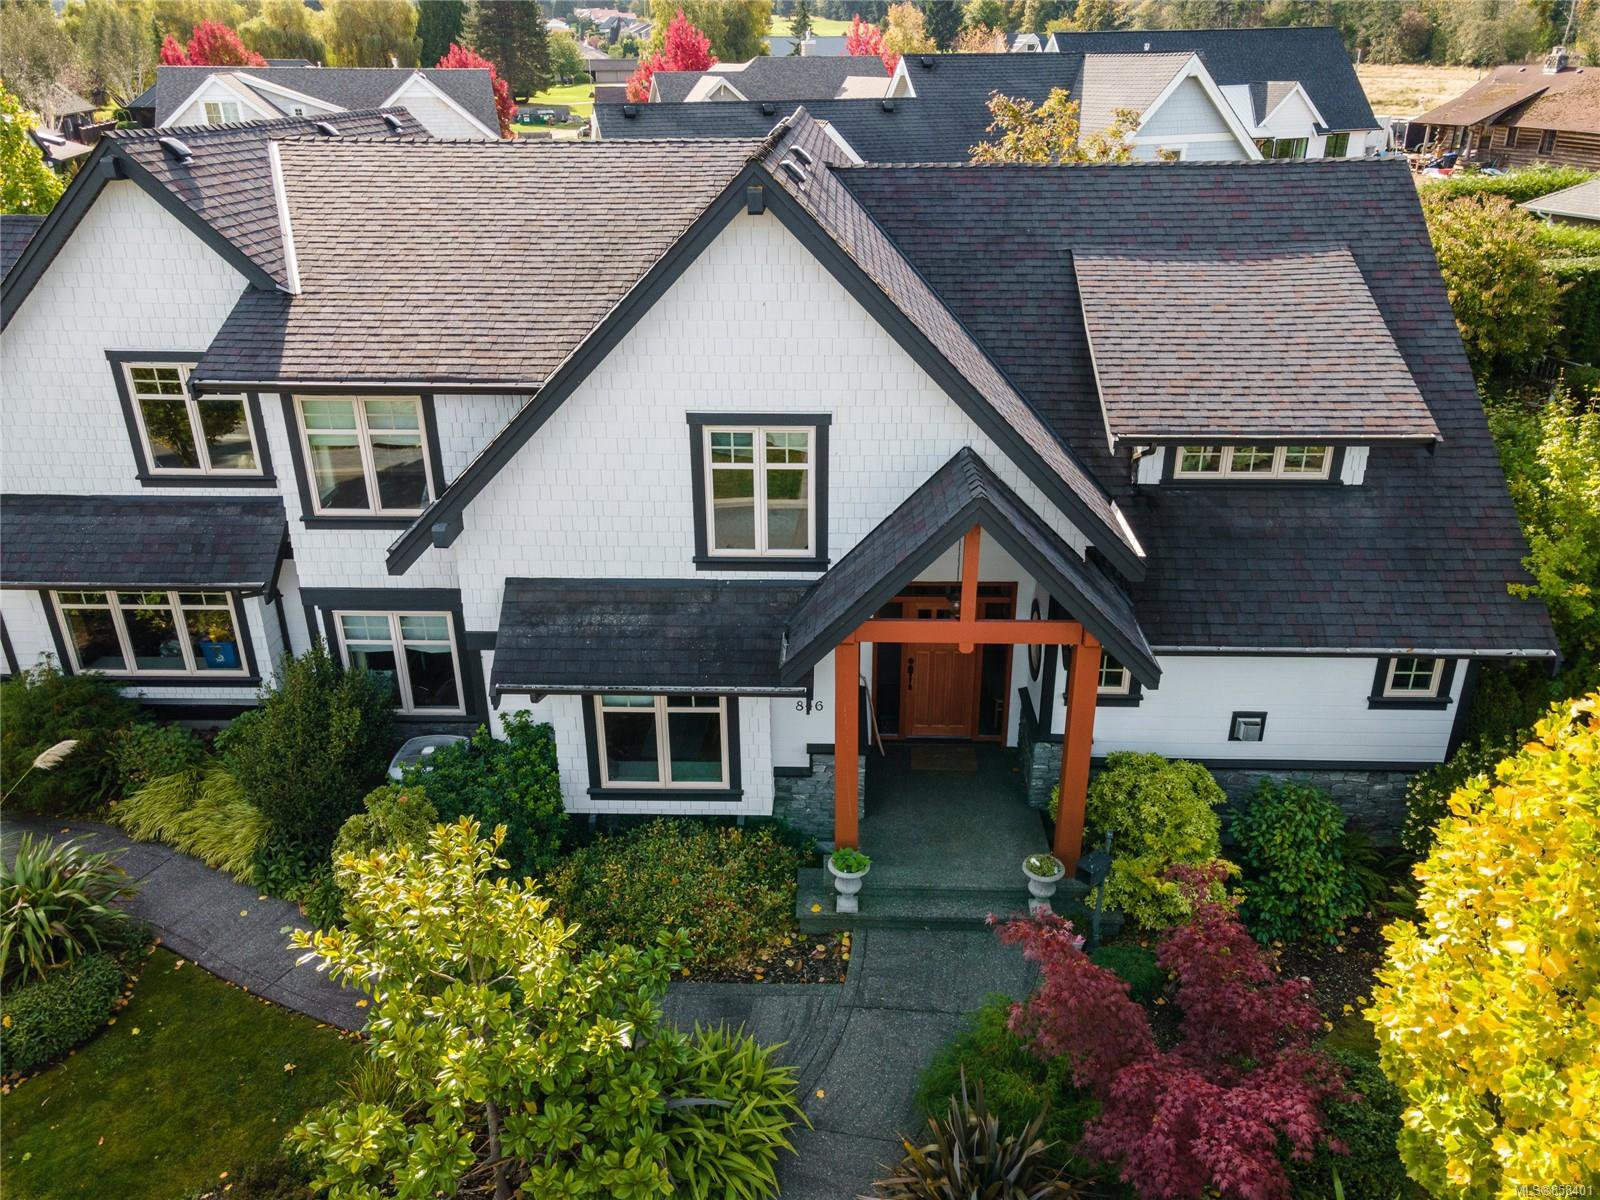 Main Photo: 846 Bluffs Dr in : PQ Qualicum Beach House for sale (Parksville/Qualicum)  : MLS®# 858401